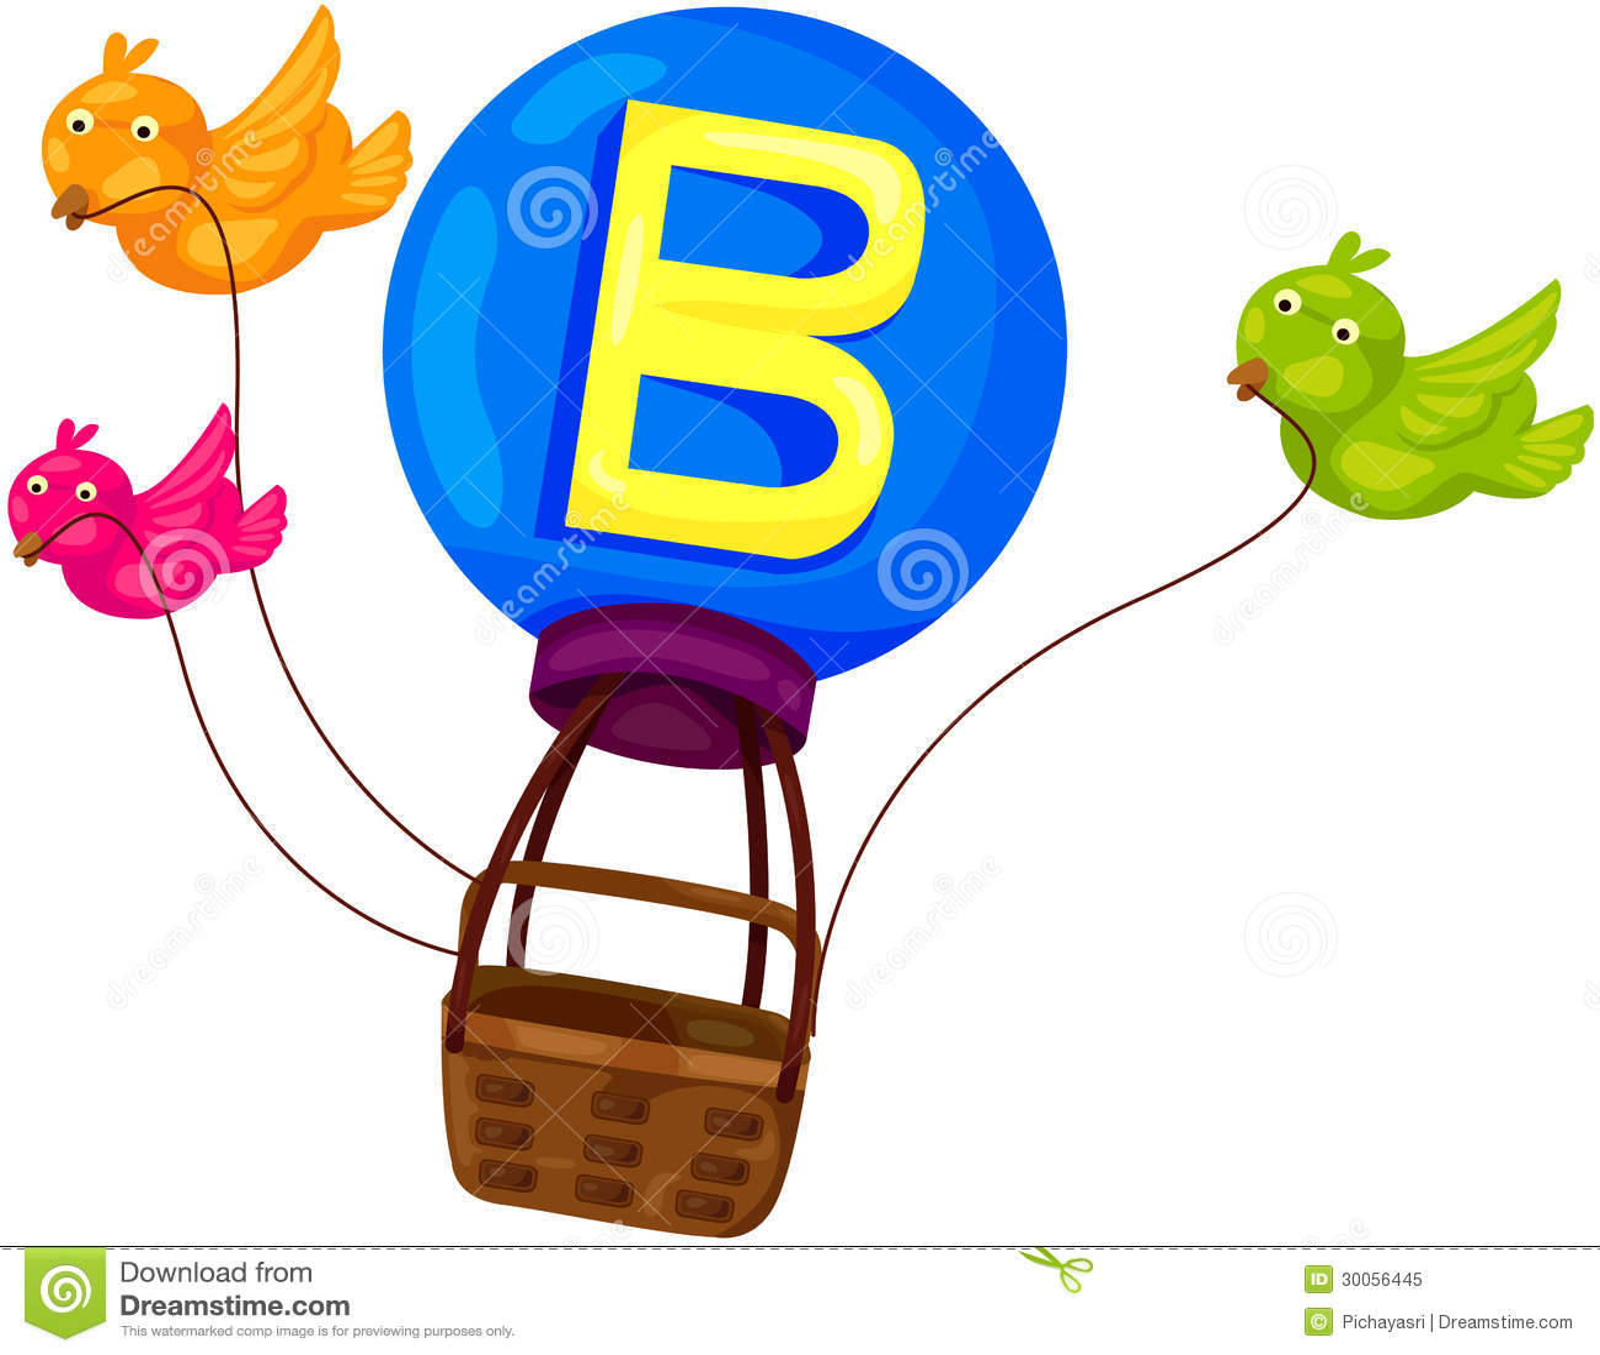 Alphabet B For Bird Royalty Free Stock Photo